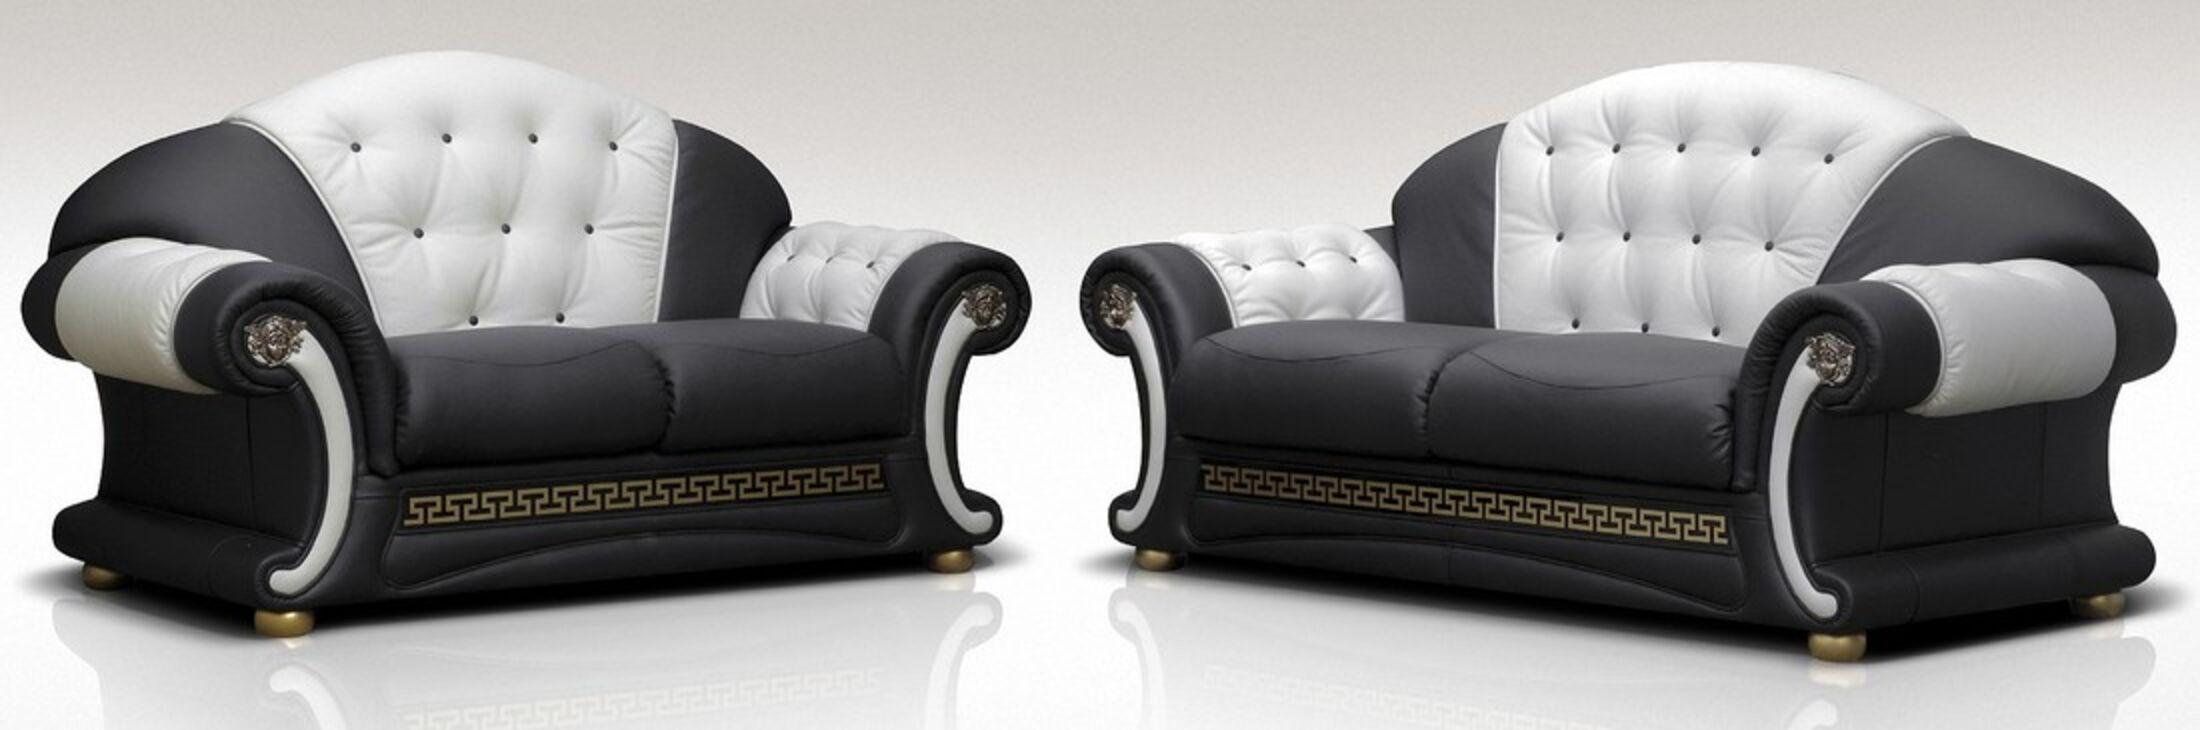 North Carolina 3 Seater + 2 Seater Genuine Italian Black White Leather Sofa  Suite Offer